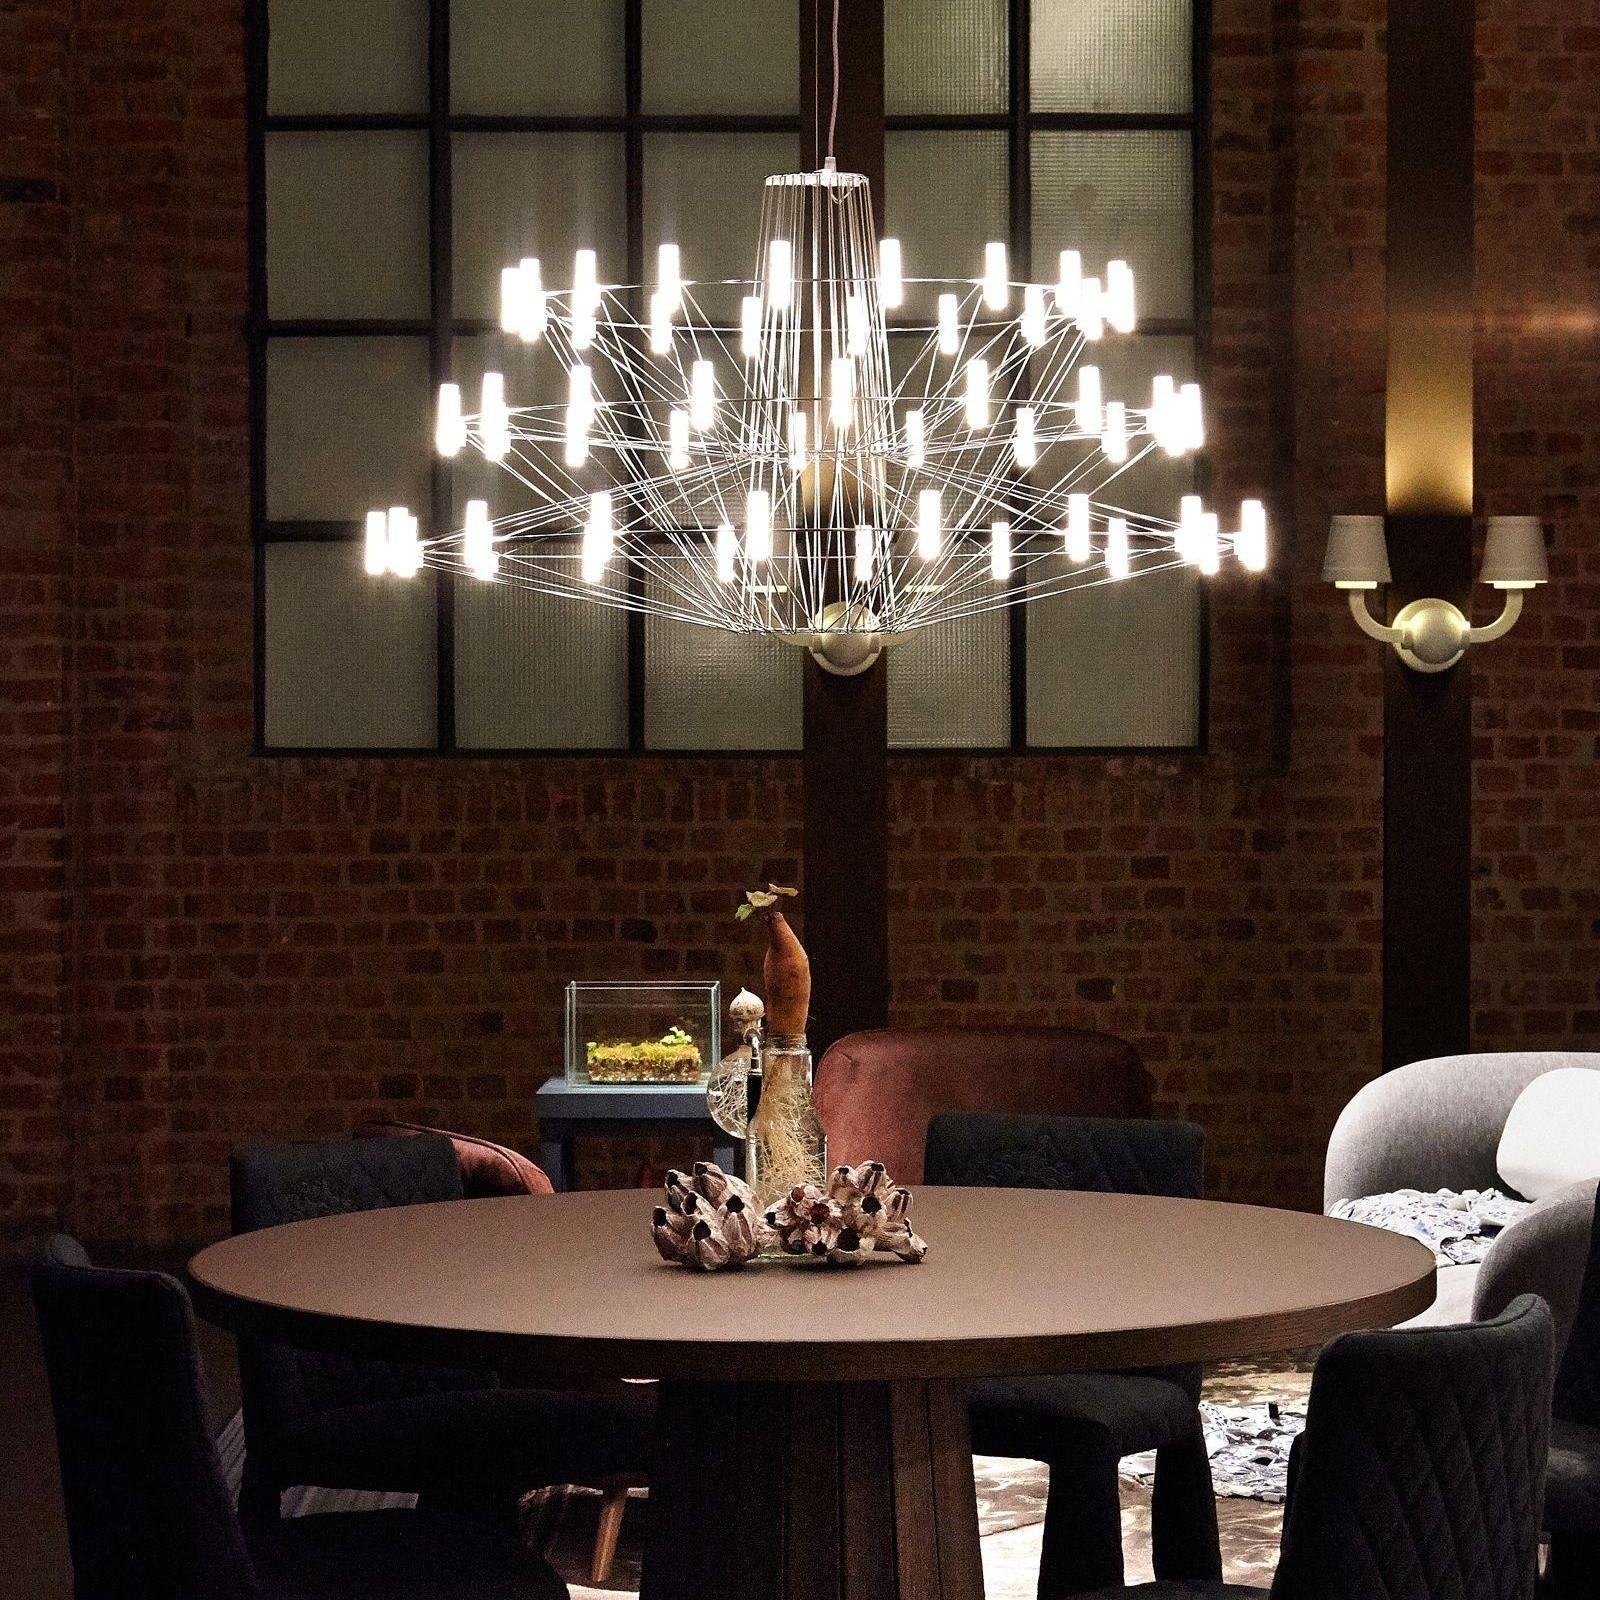 Dezign Lover Blog | Home decor ideas : Modern mid-century lighting ideas